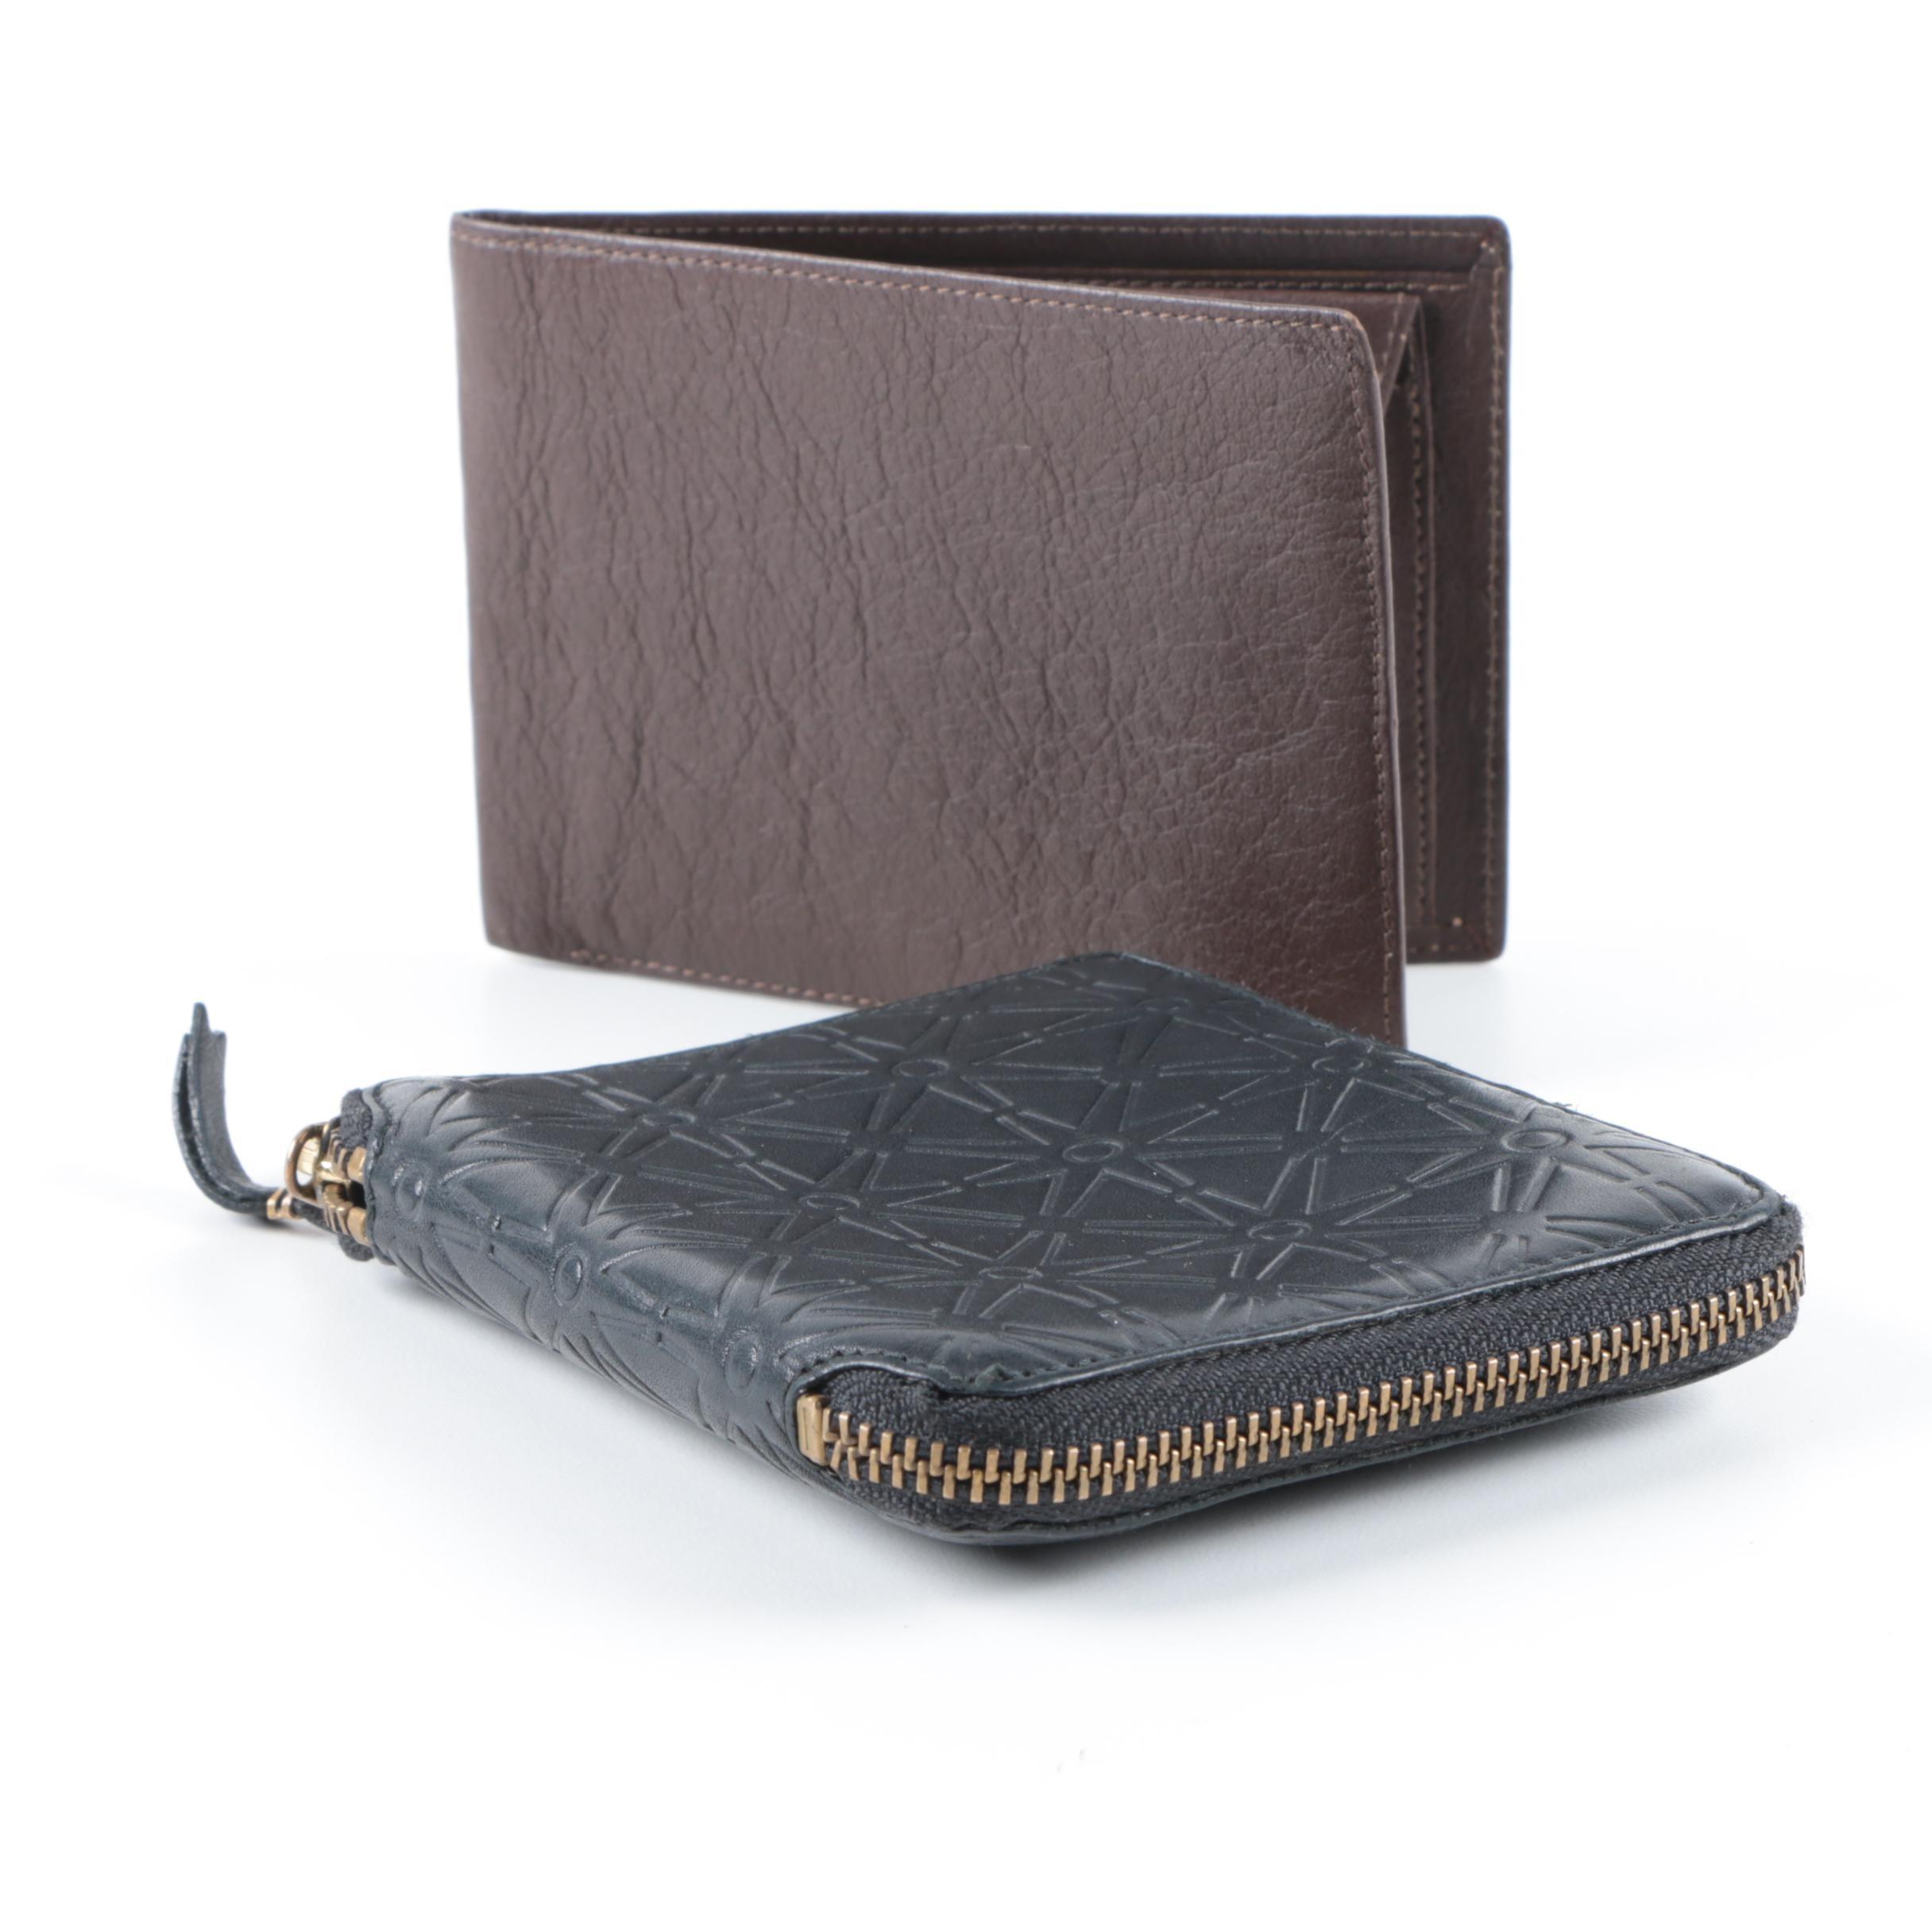 Zippered Wallet and Billfold Including Comme des Garçons